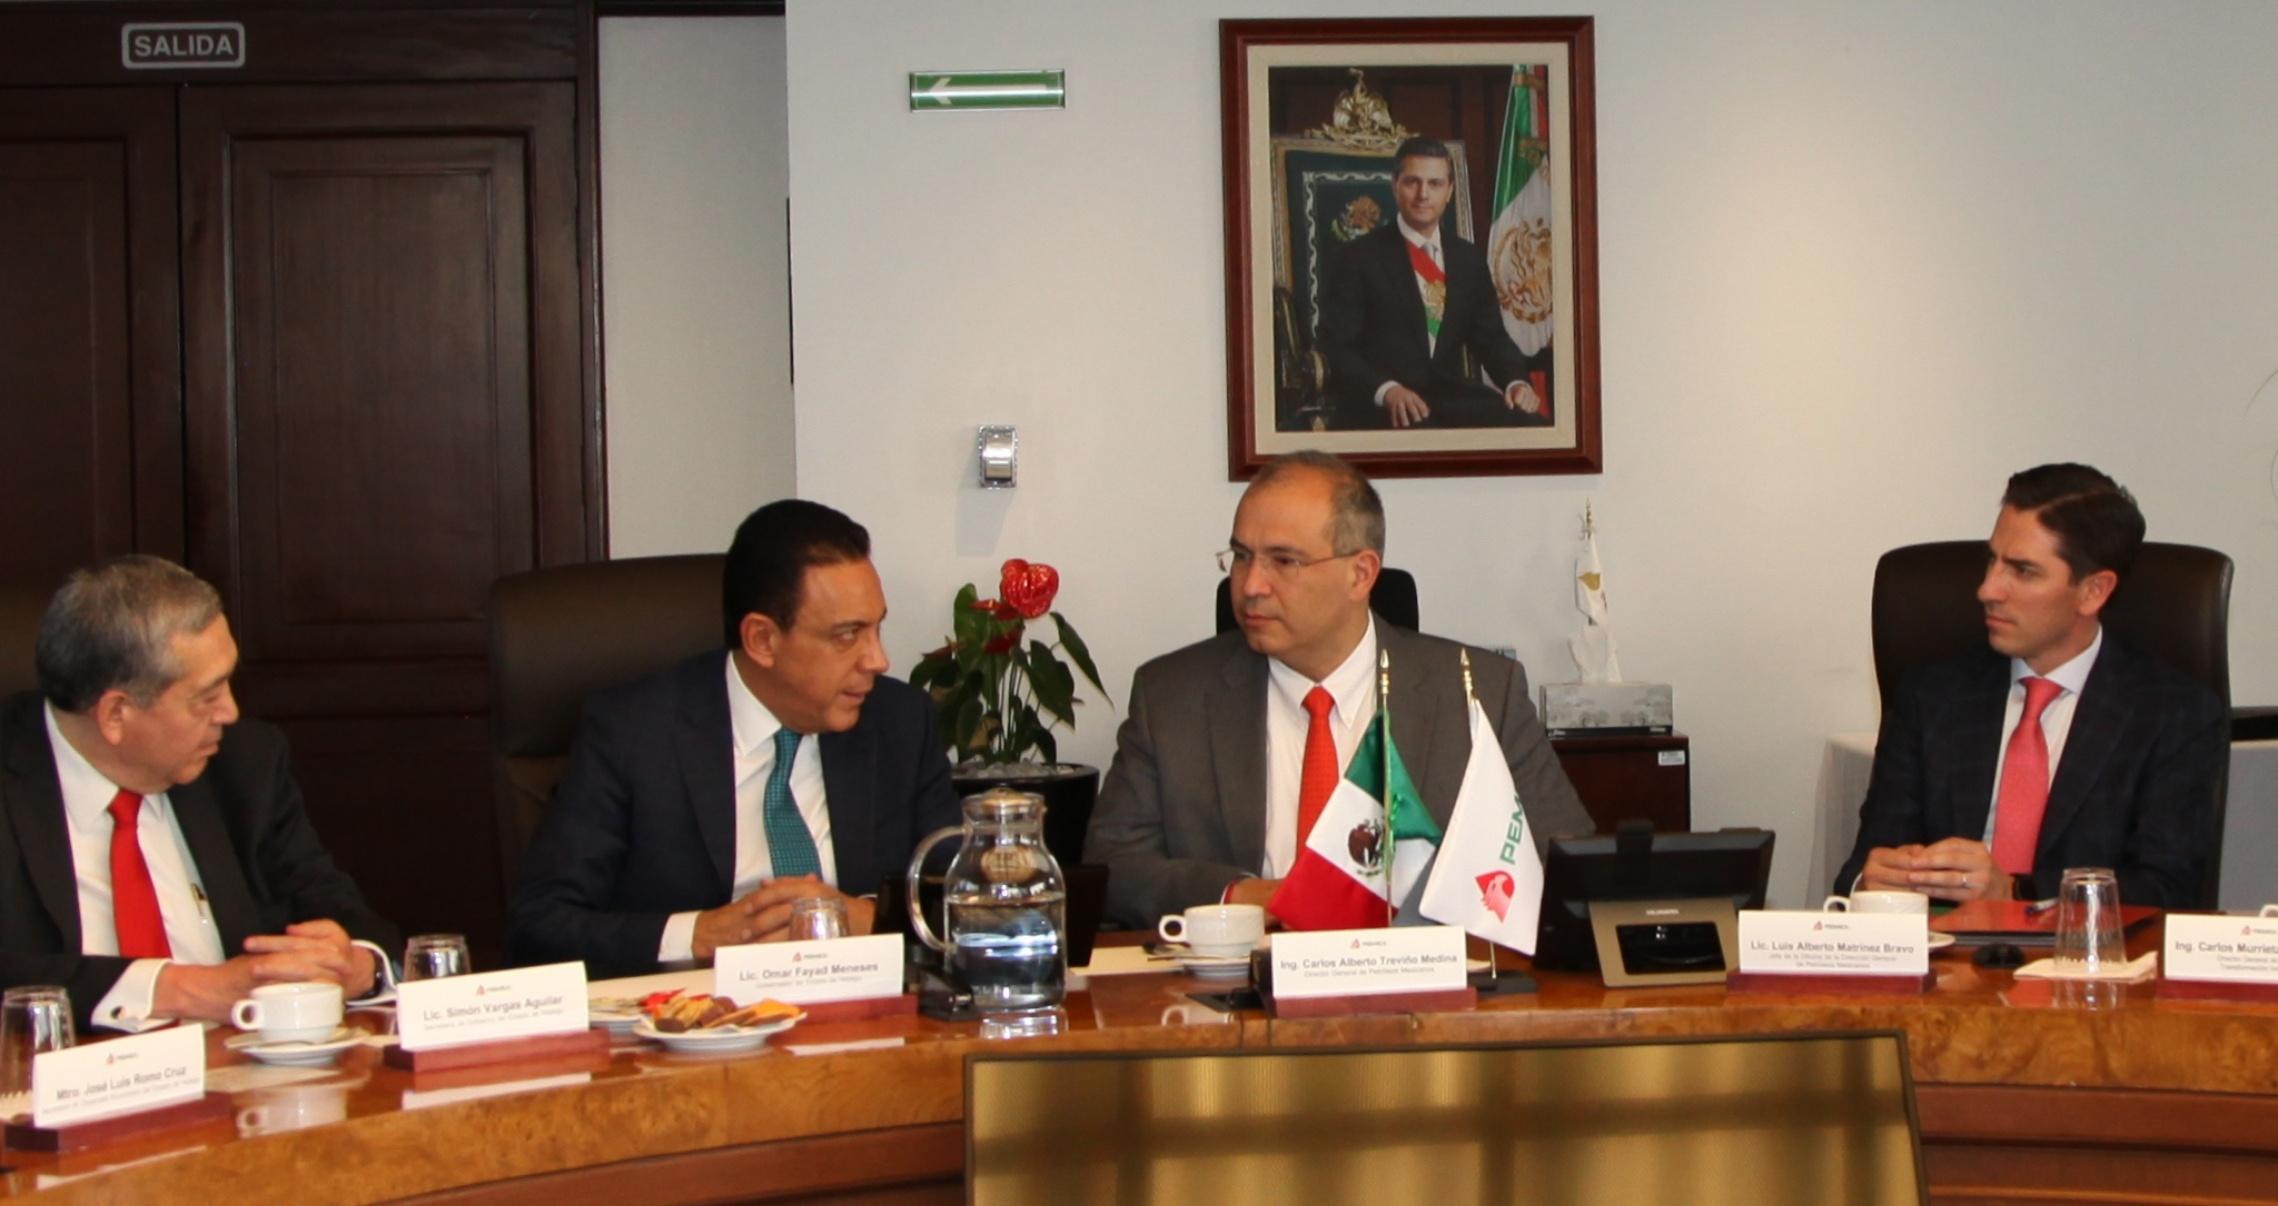 Pemex e Hidalgo discuten medidas contra ordeña de combustible